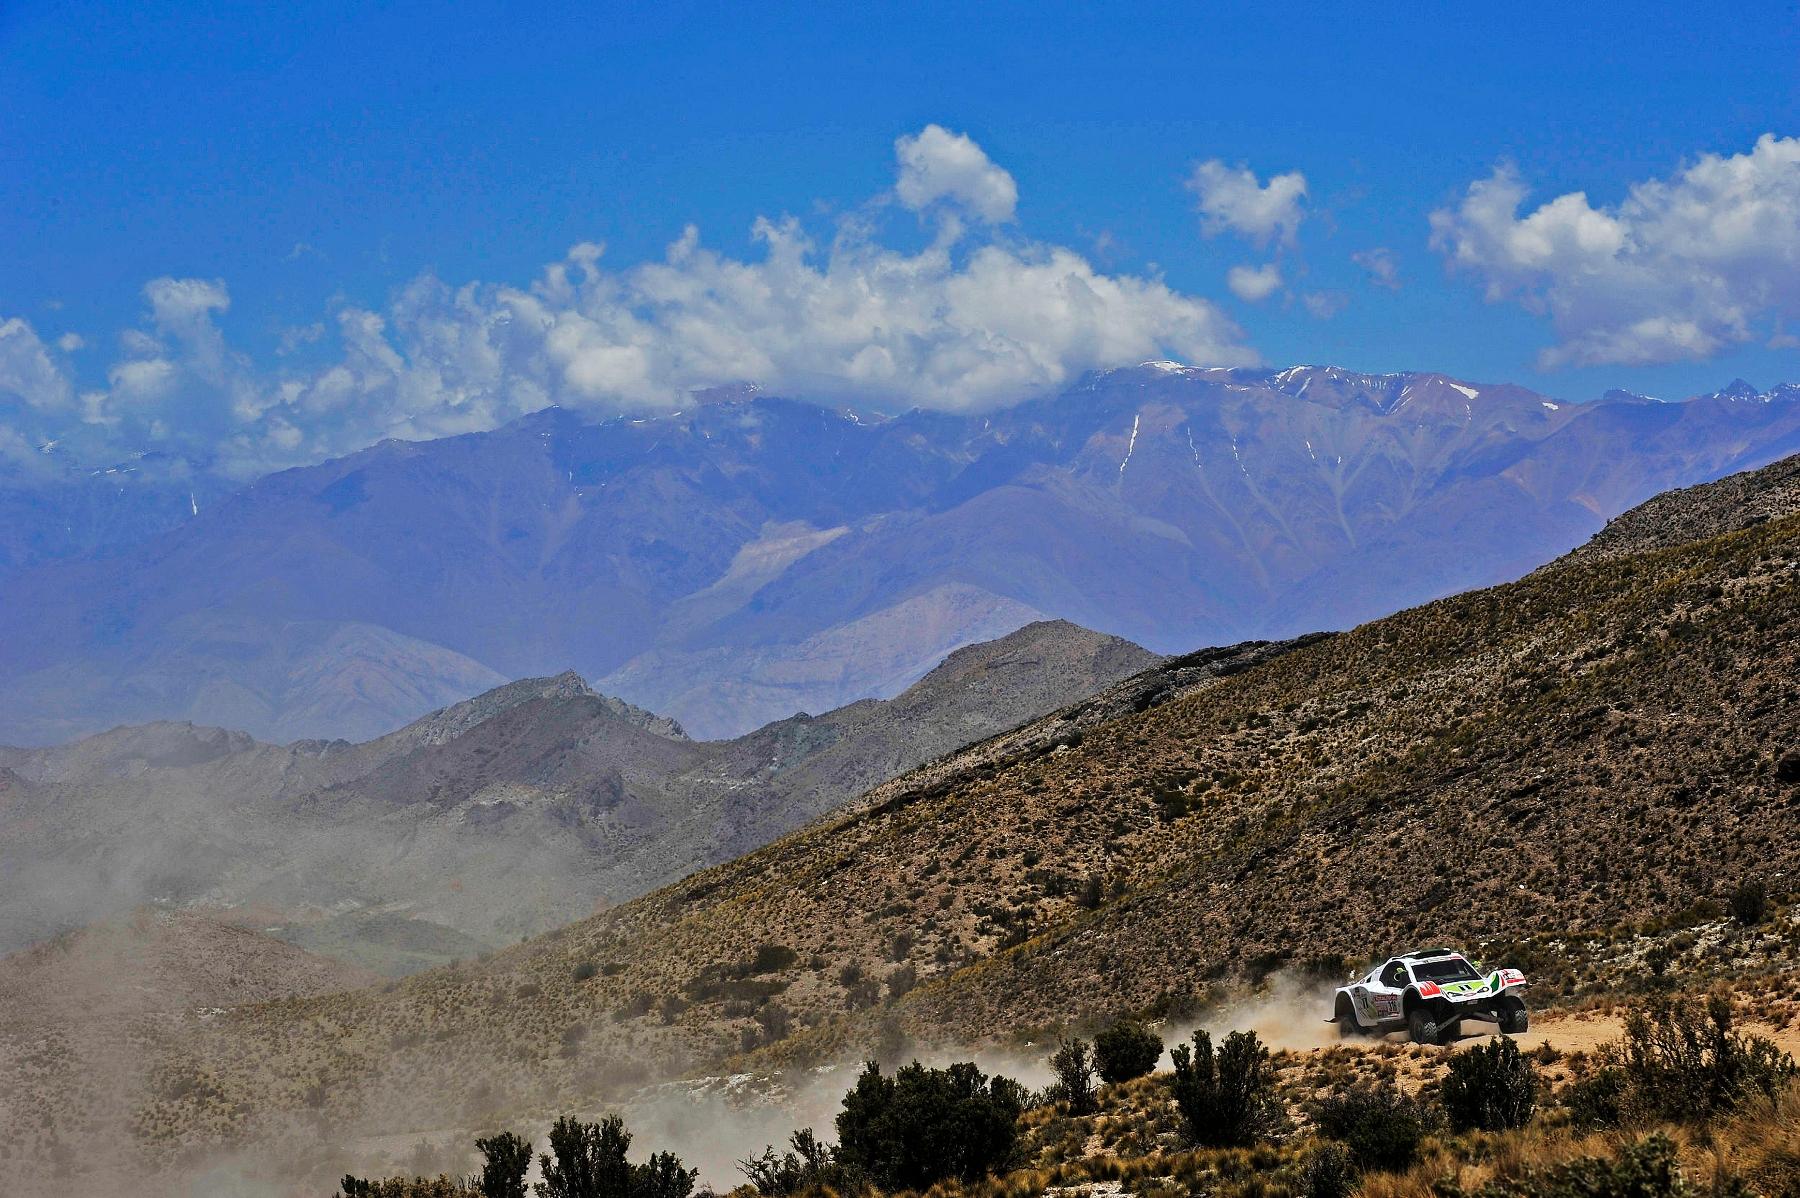 MOTORSPORT - DAKAR ARGENTINA CHILE PERU 2012 - STAGE 3 - SAN RAFAEL (ARG) TO SAN JUAN (ARG)  - 03/01/2012 - PHOTO: DPPI